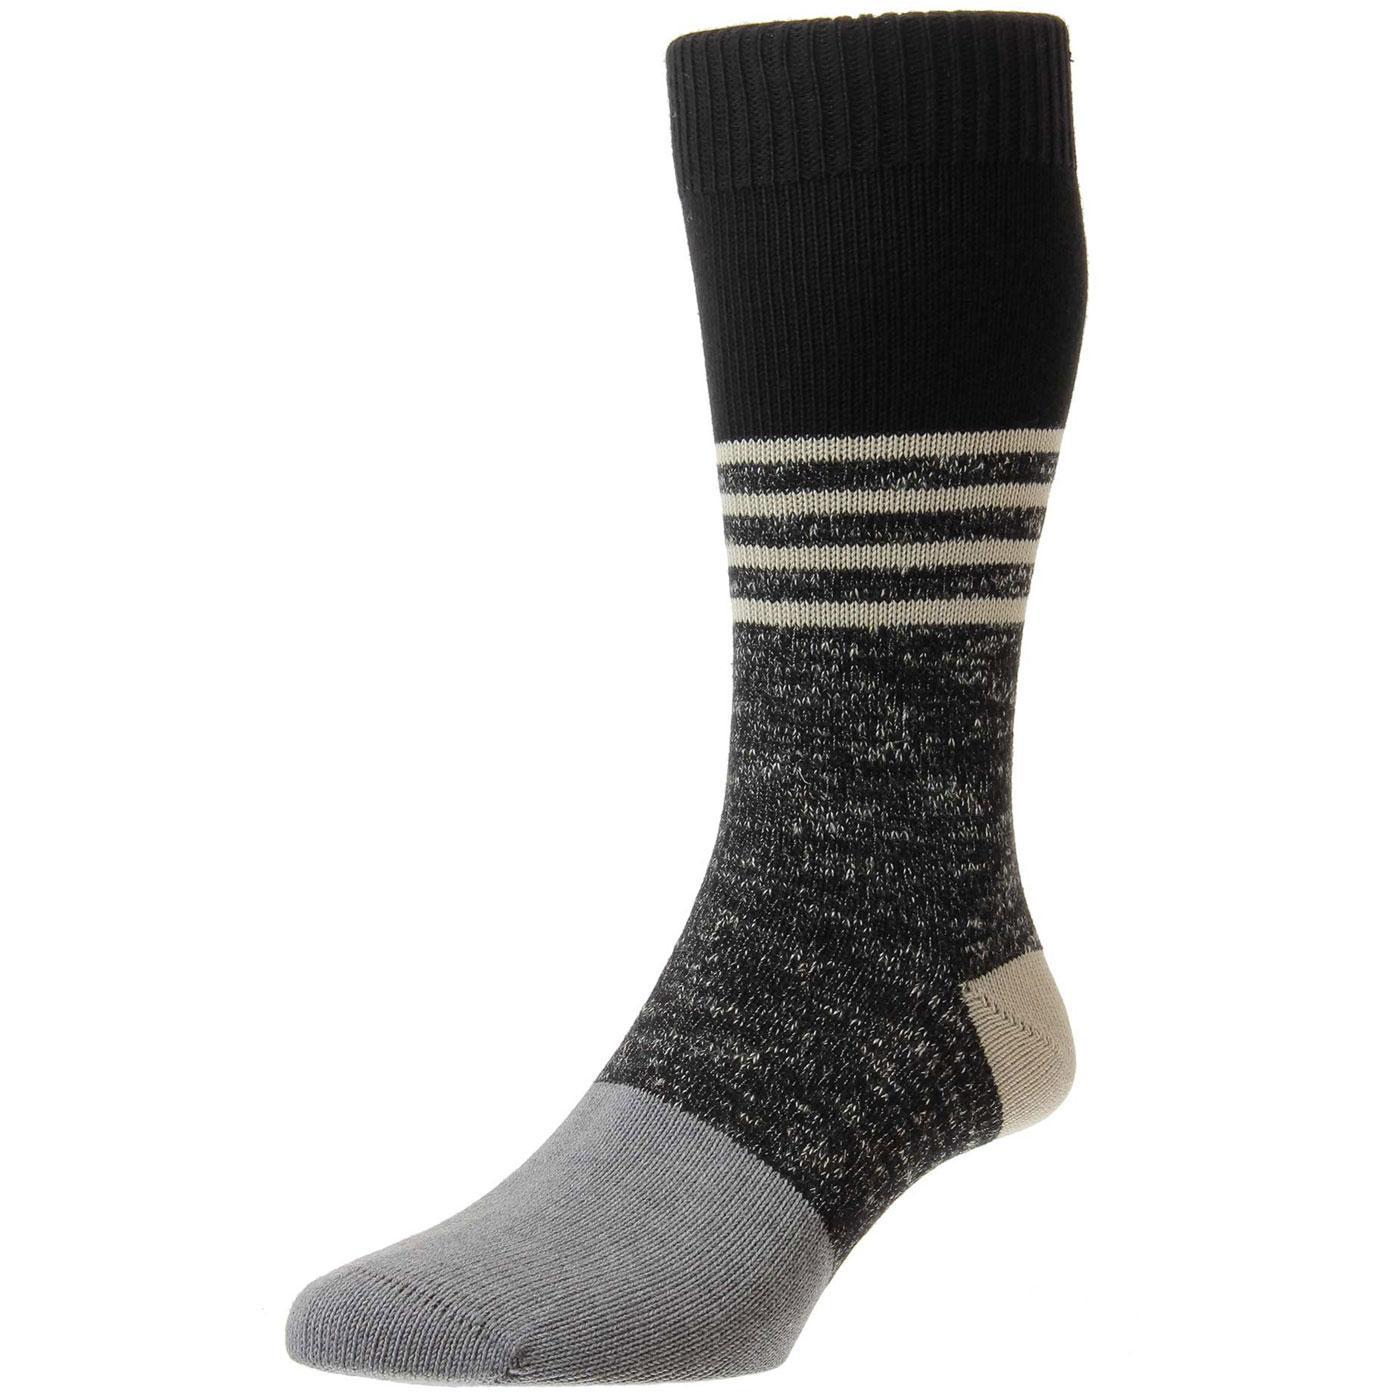 + Denny PANTHERELLA Men's Cashmere Socks in Black